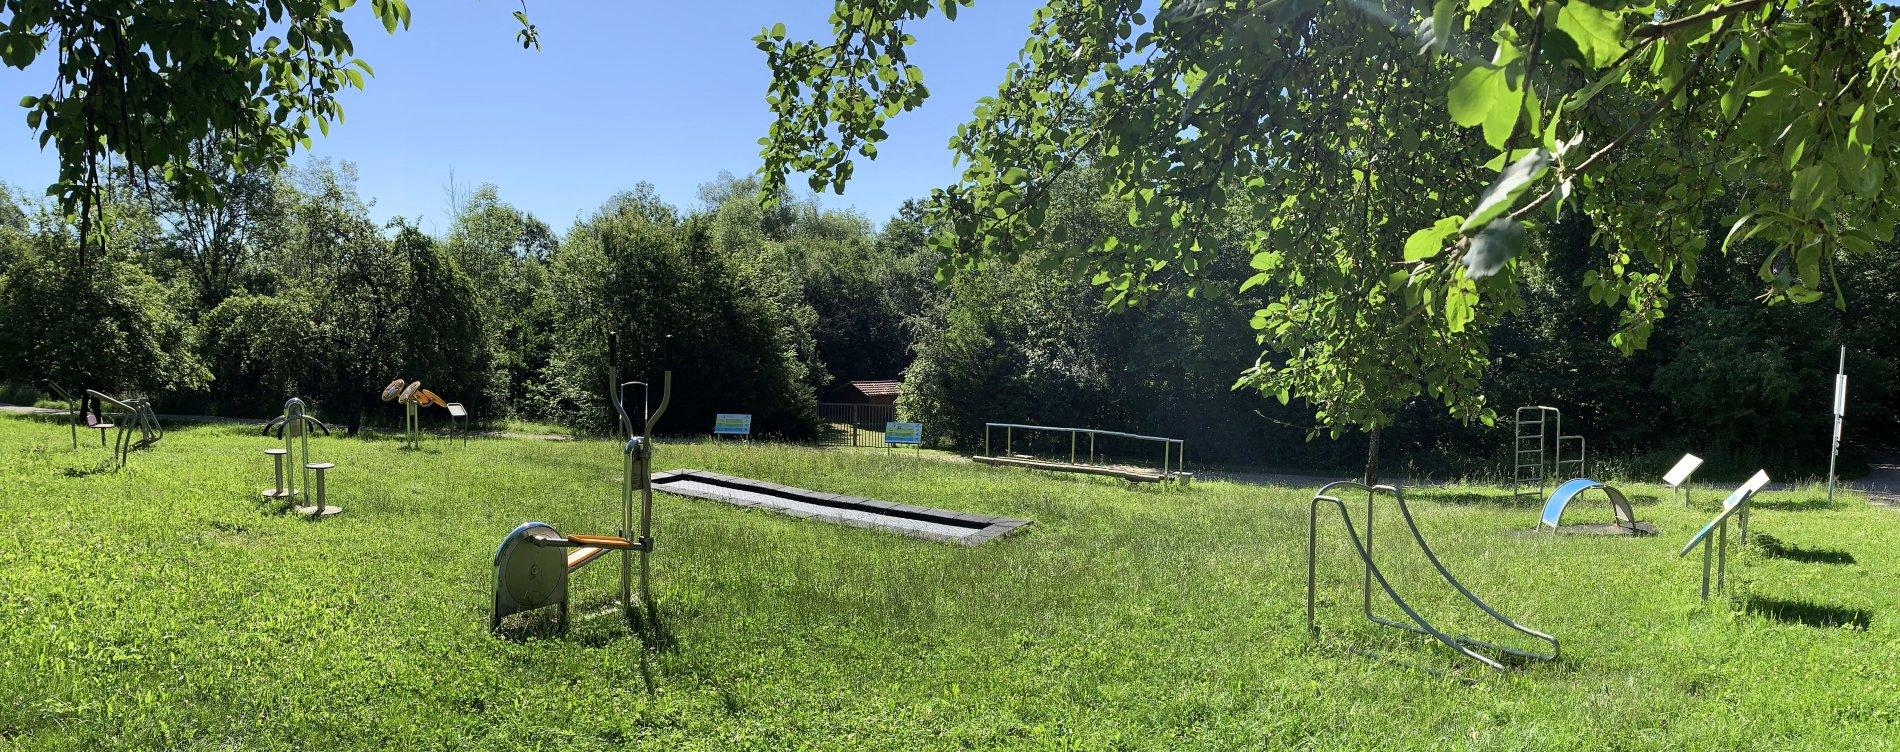 Generationenpark Pfingsthalde